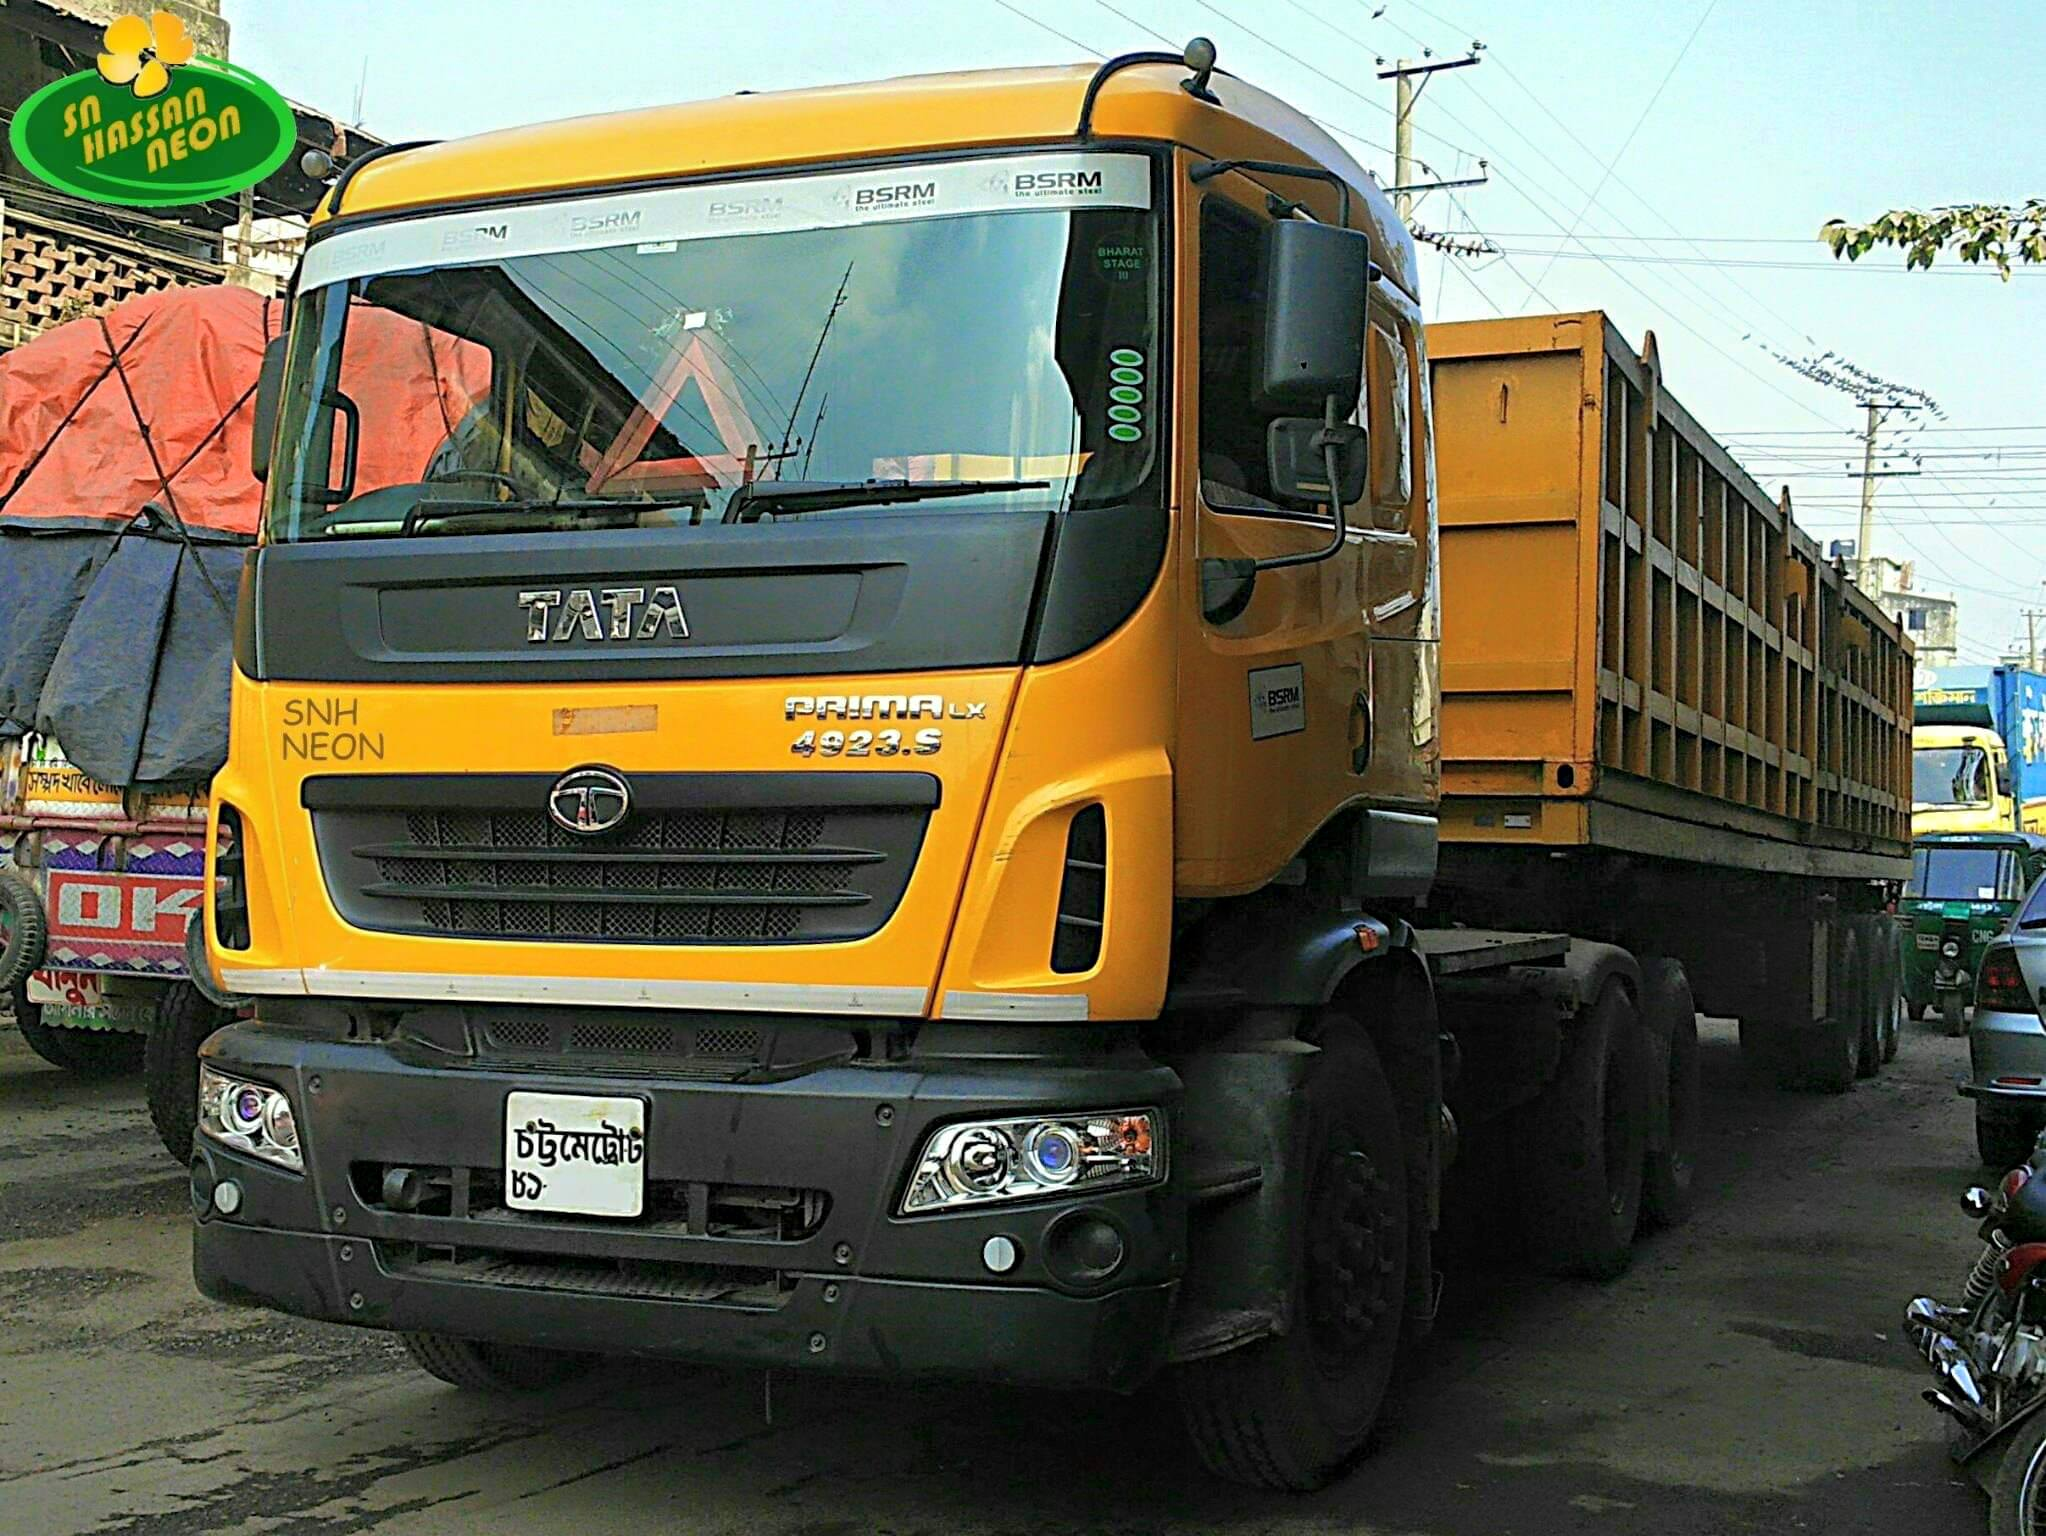 TATA-Prima-LX-4923-S-